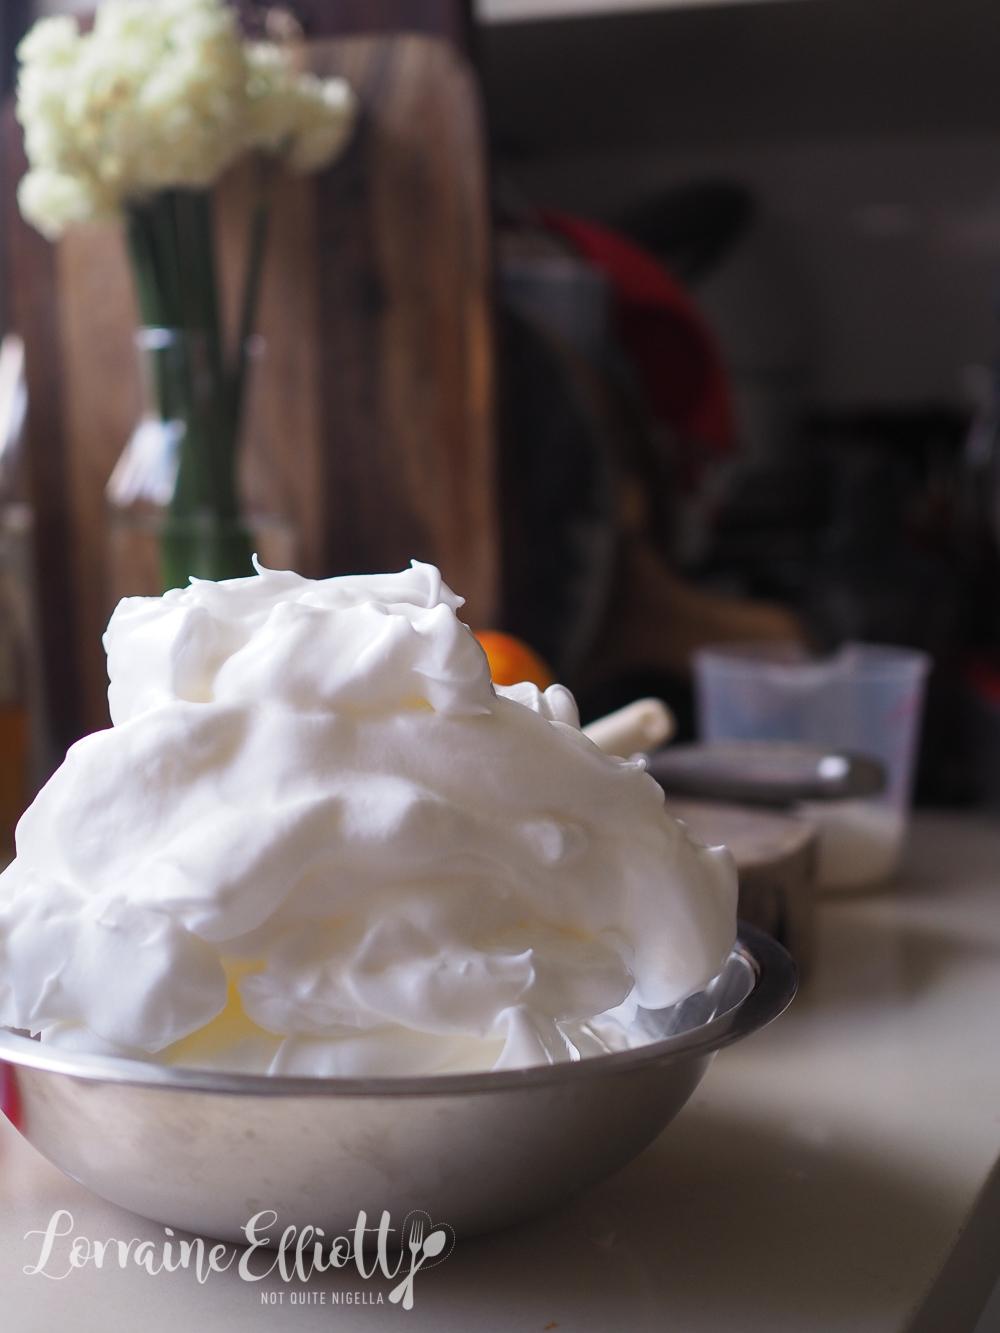 Blood Orange Chiffon Cake recipe